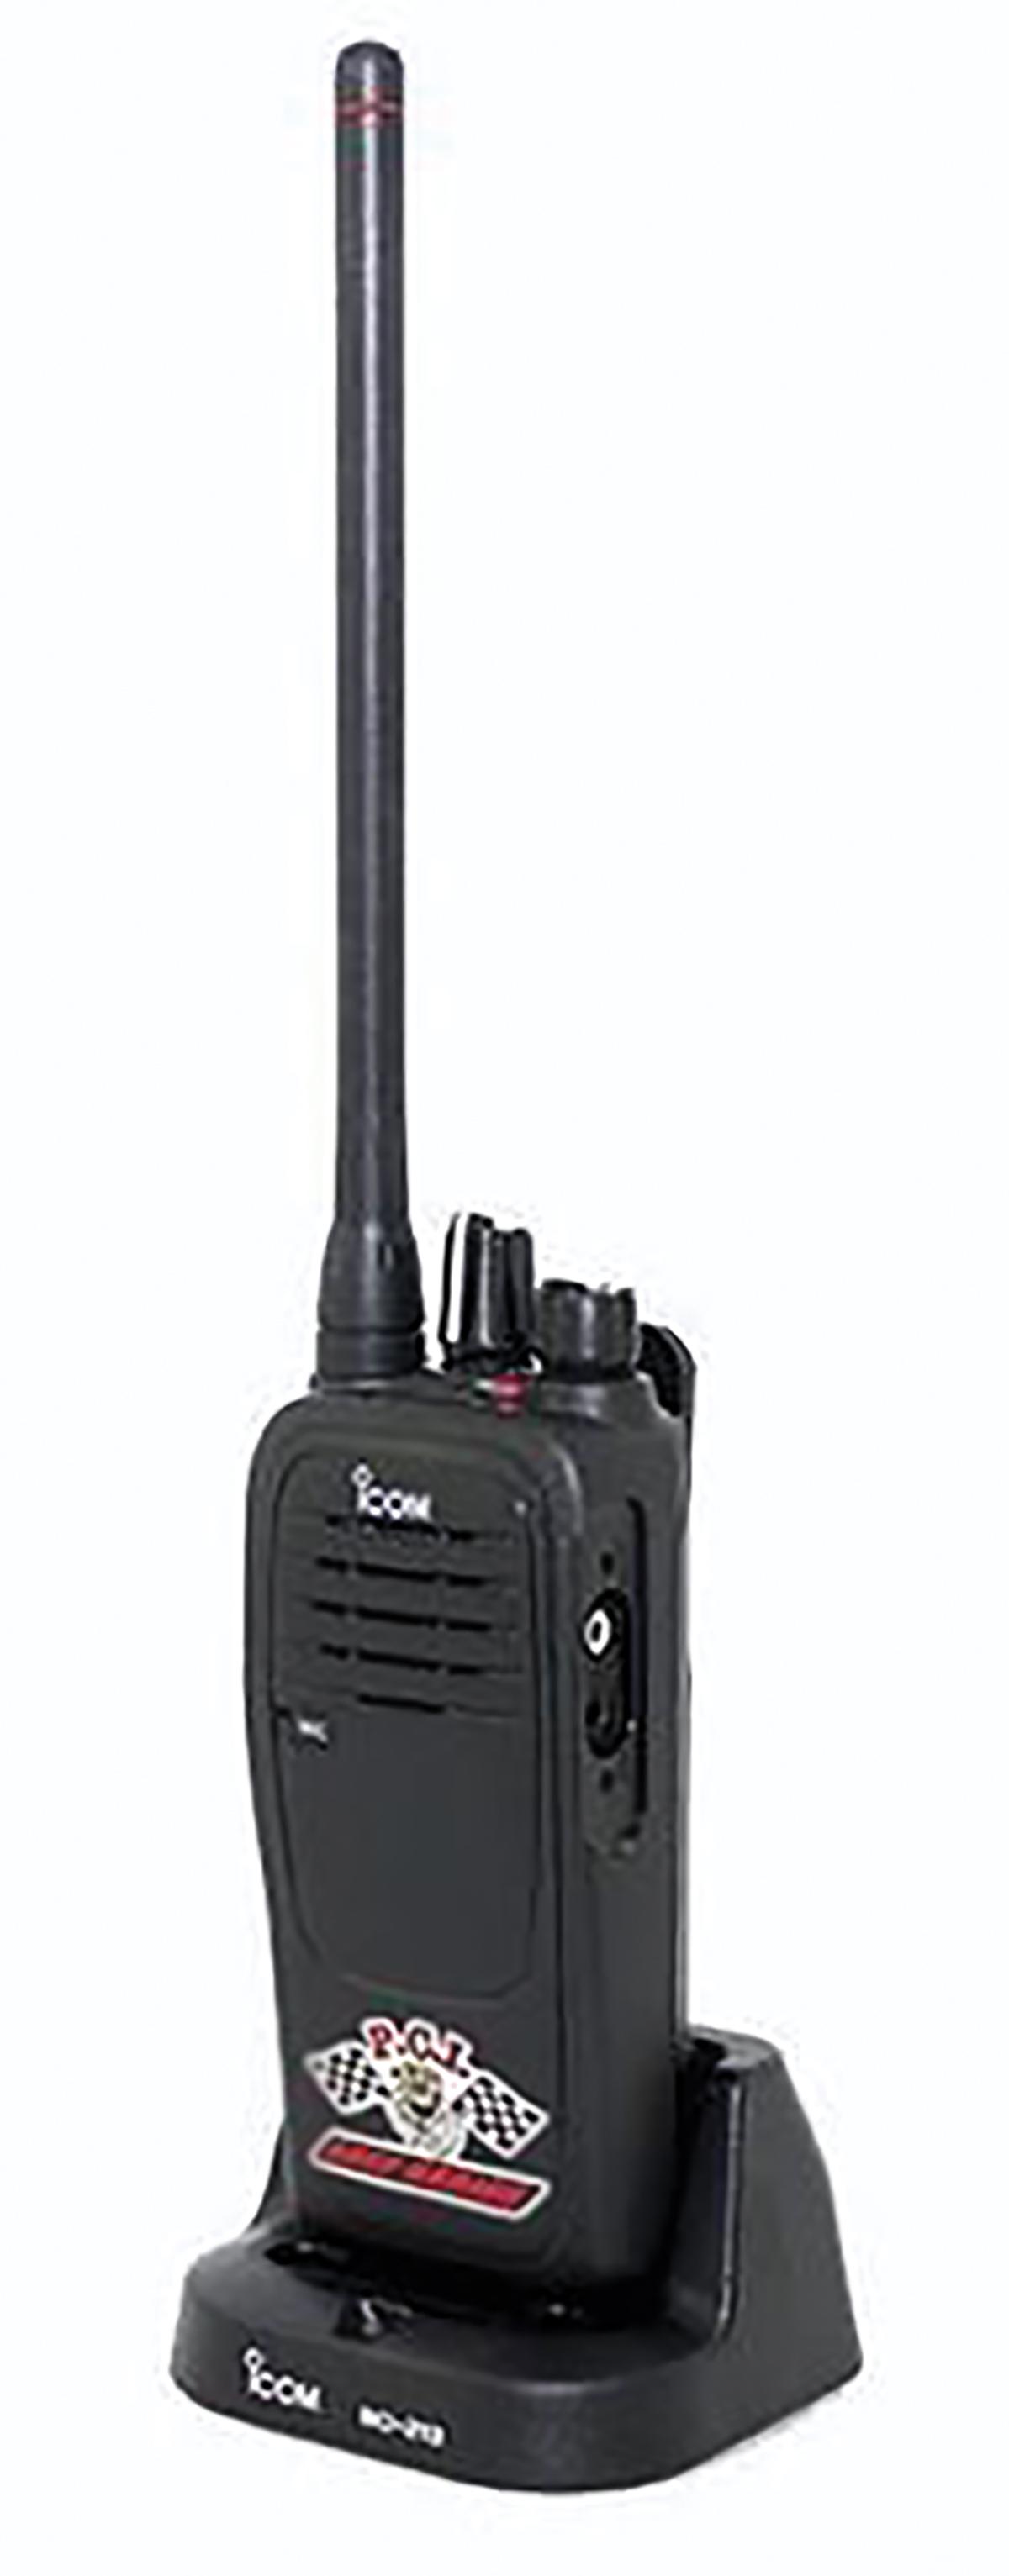 UTV COMMUNICATION SYSTEMS | UTV Action Magazine